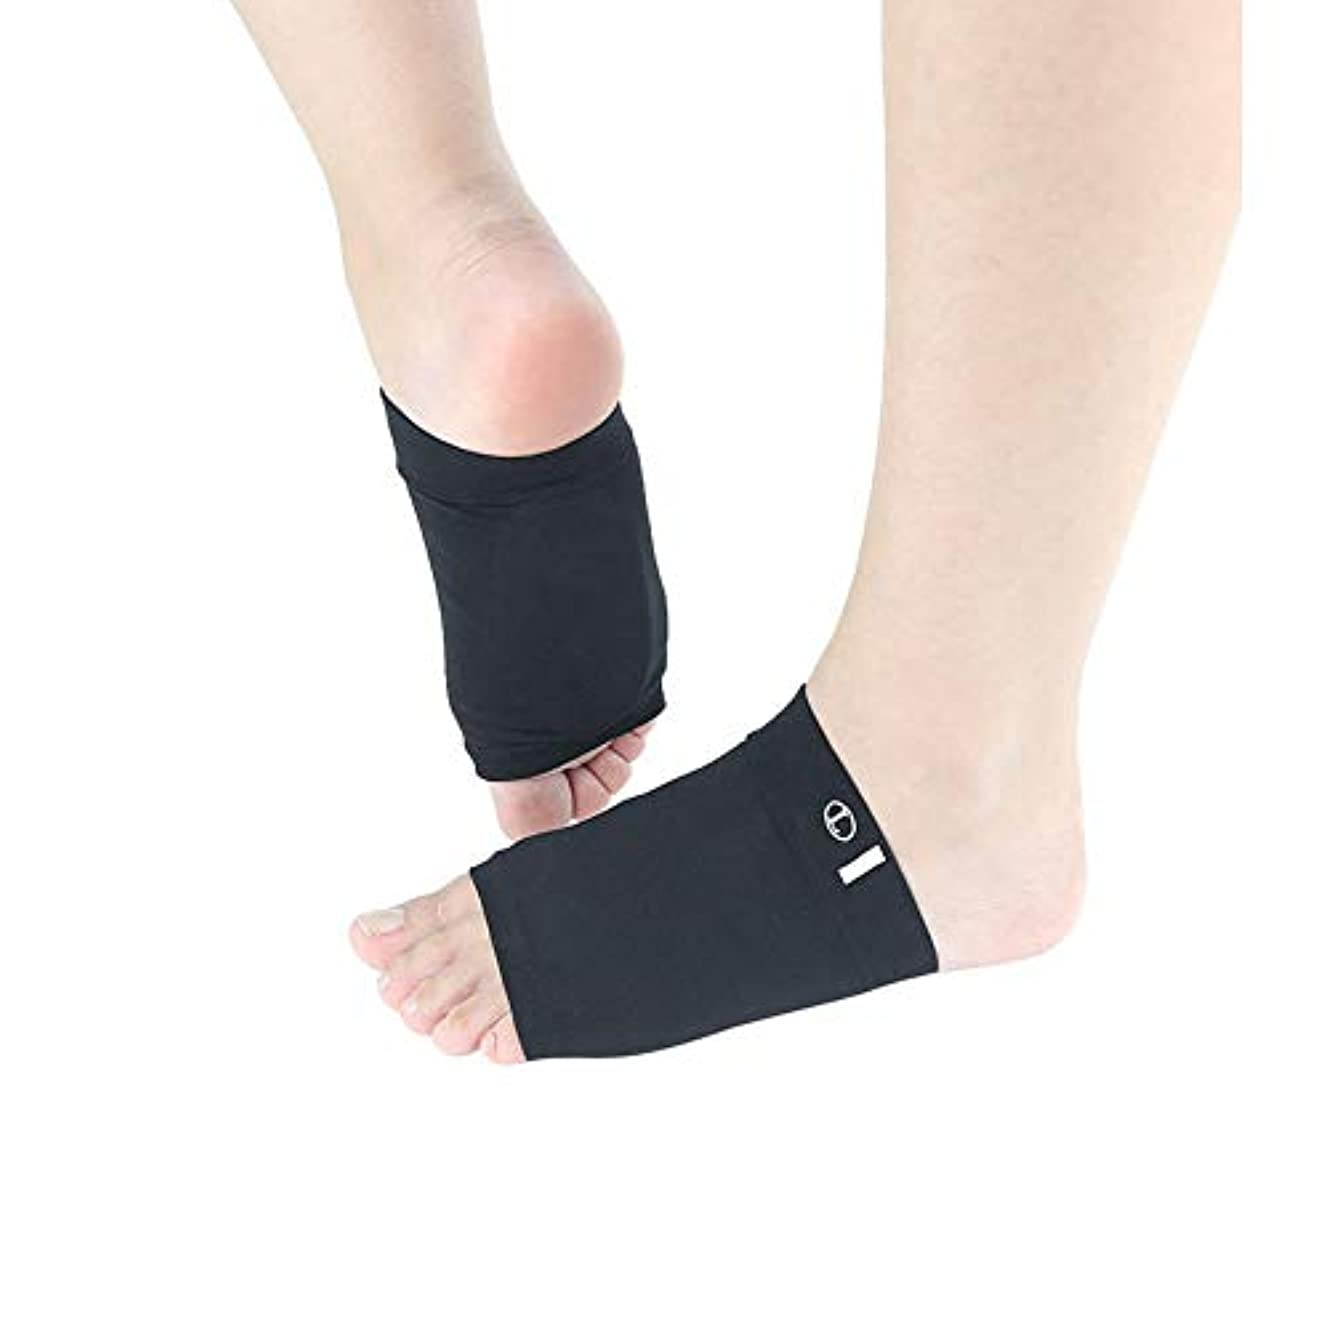 TCATEC 扁平足 サポーター アーチサポーター 偏平足 矯正 足裏 土踏まず むくみ解消 衝撃吸収 足底筋膜炎 足の痛み対策 歩行 立ち仕事 フリーサイズ 男女兼用